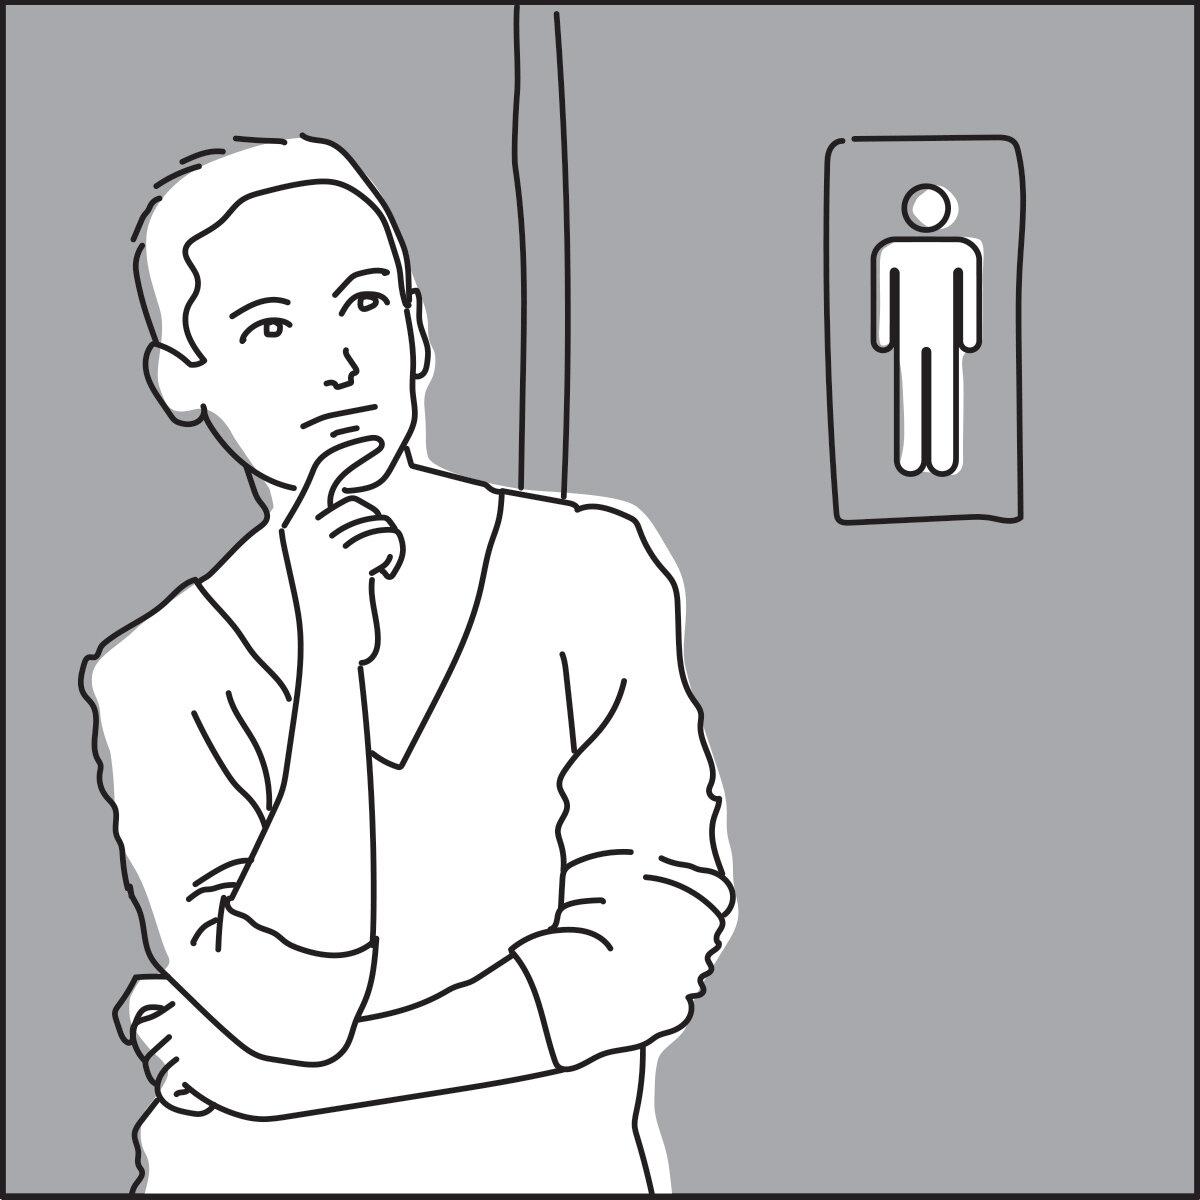 artwork-gender-identity.jpg